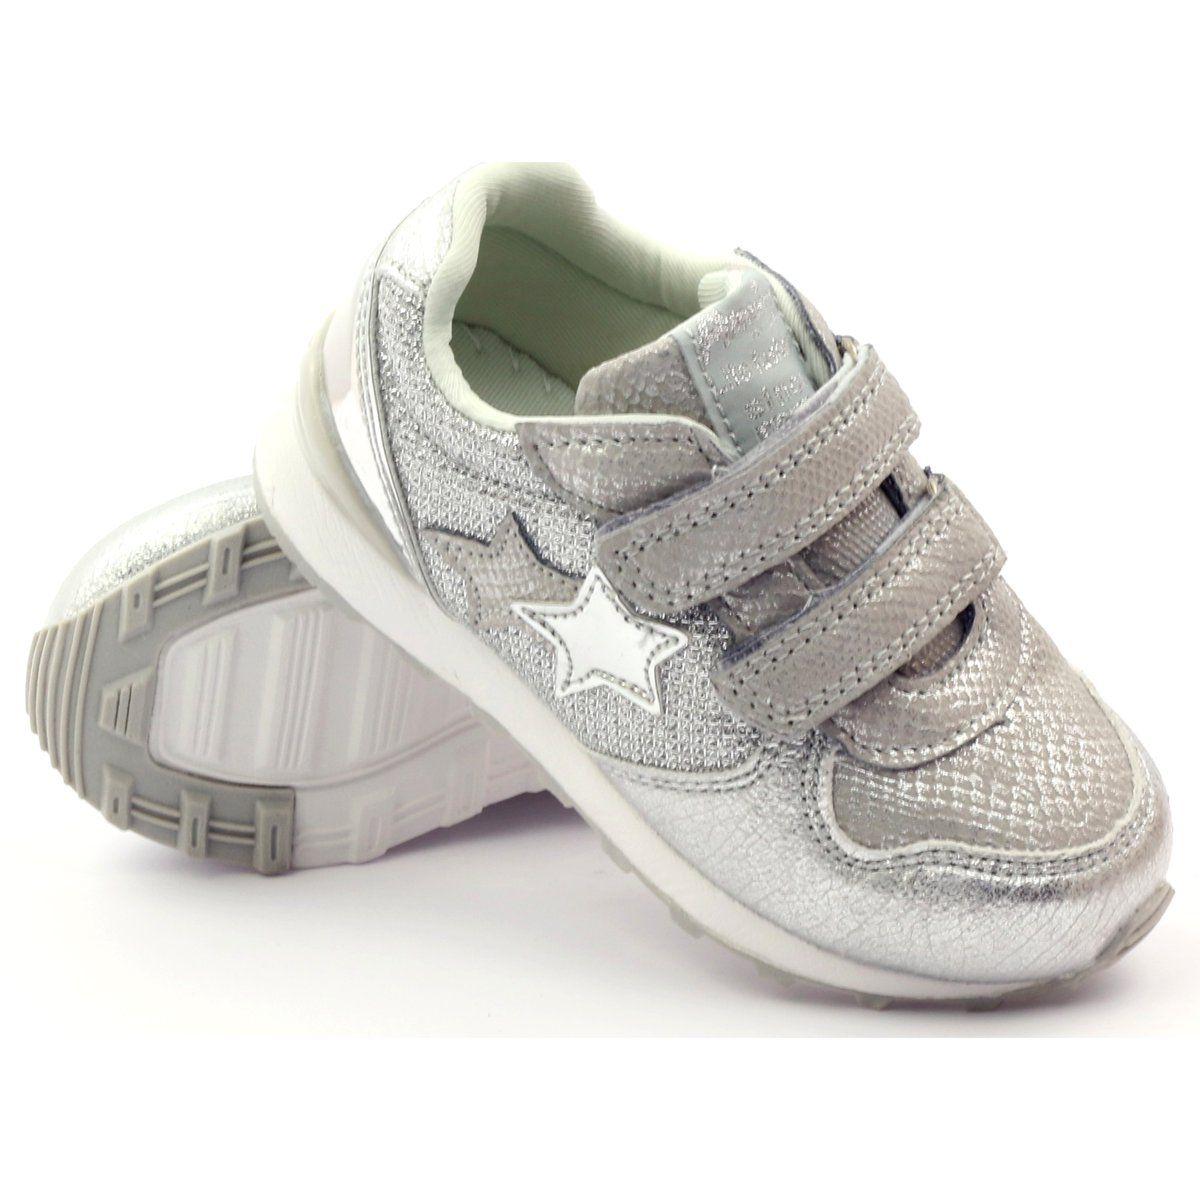 American Club Adi Sportowe Trampki American 17355 Zolte Szare Shoes Sneakers Fashion